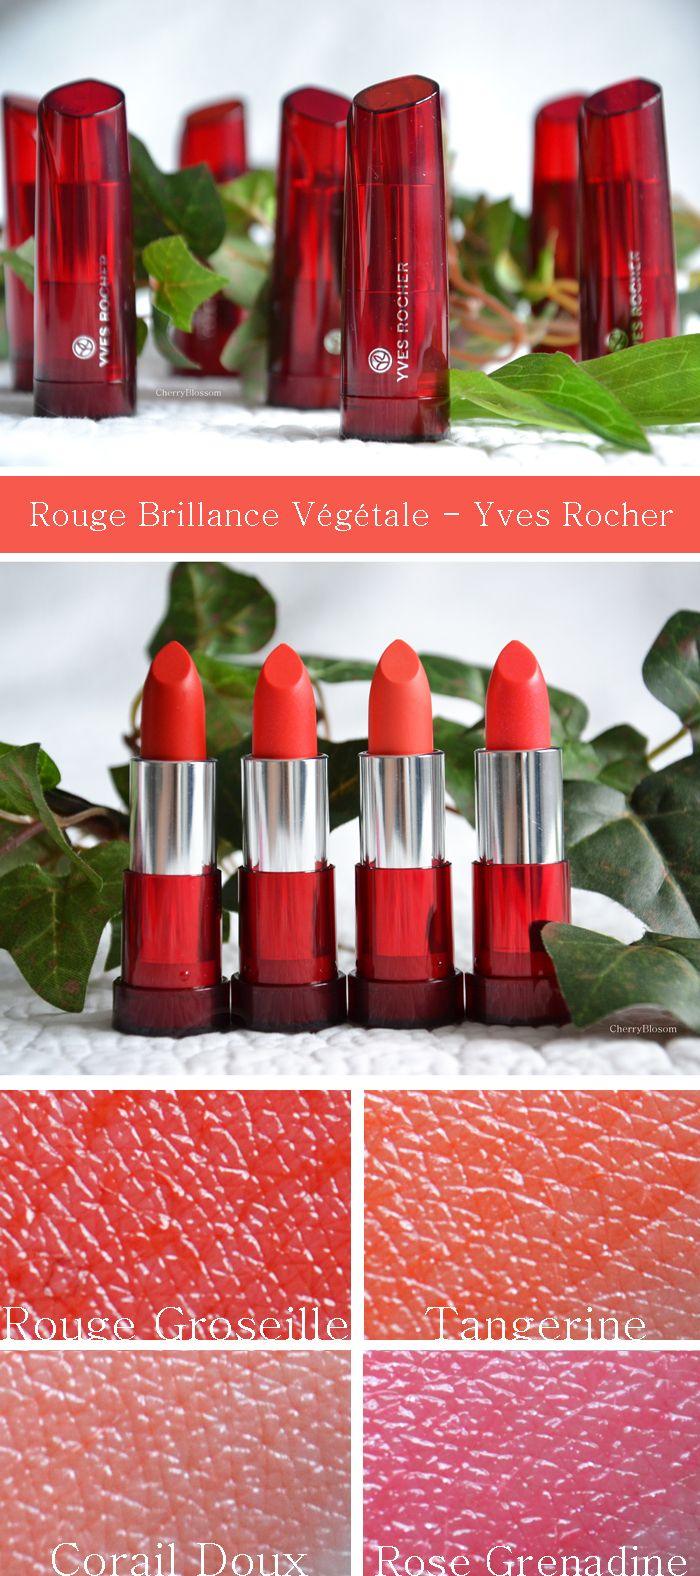 Rouge Brillance Végétale - Yves Rocher | CherryBlogssom